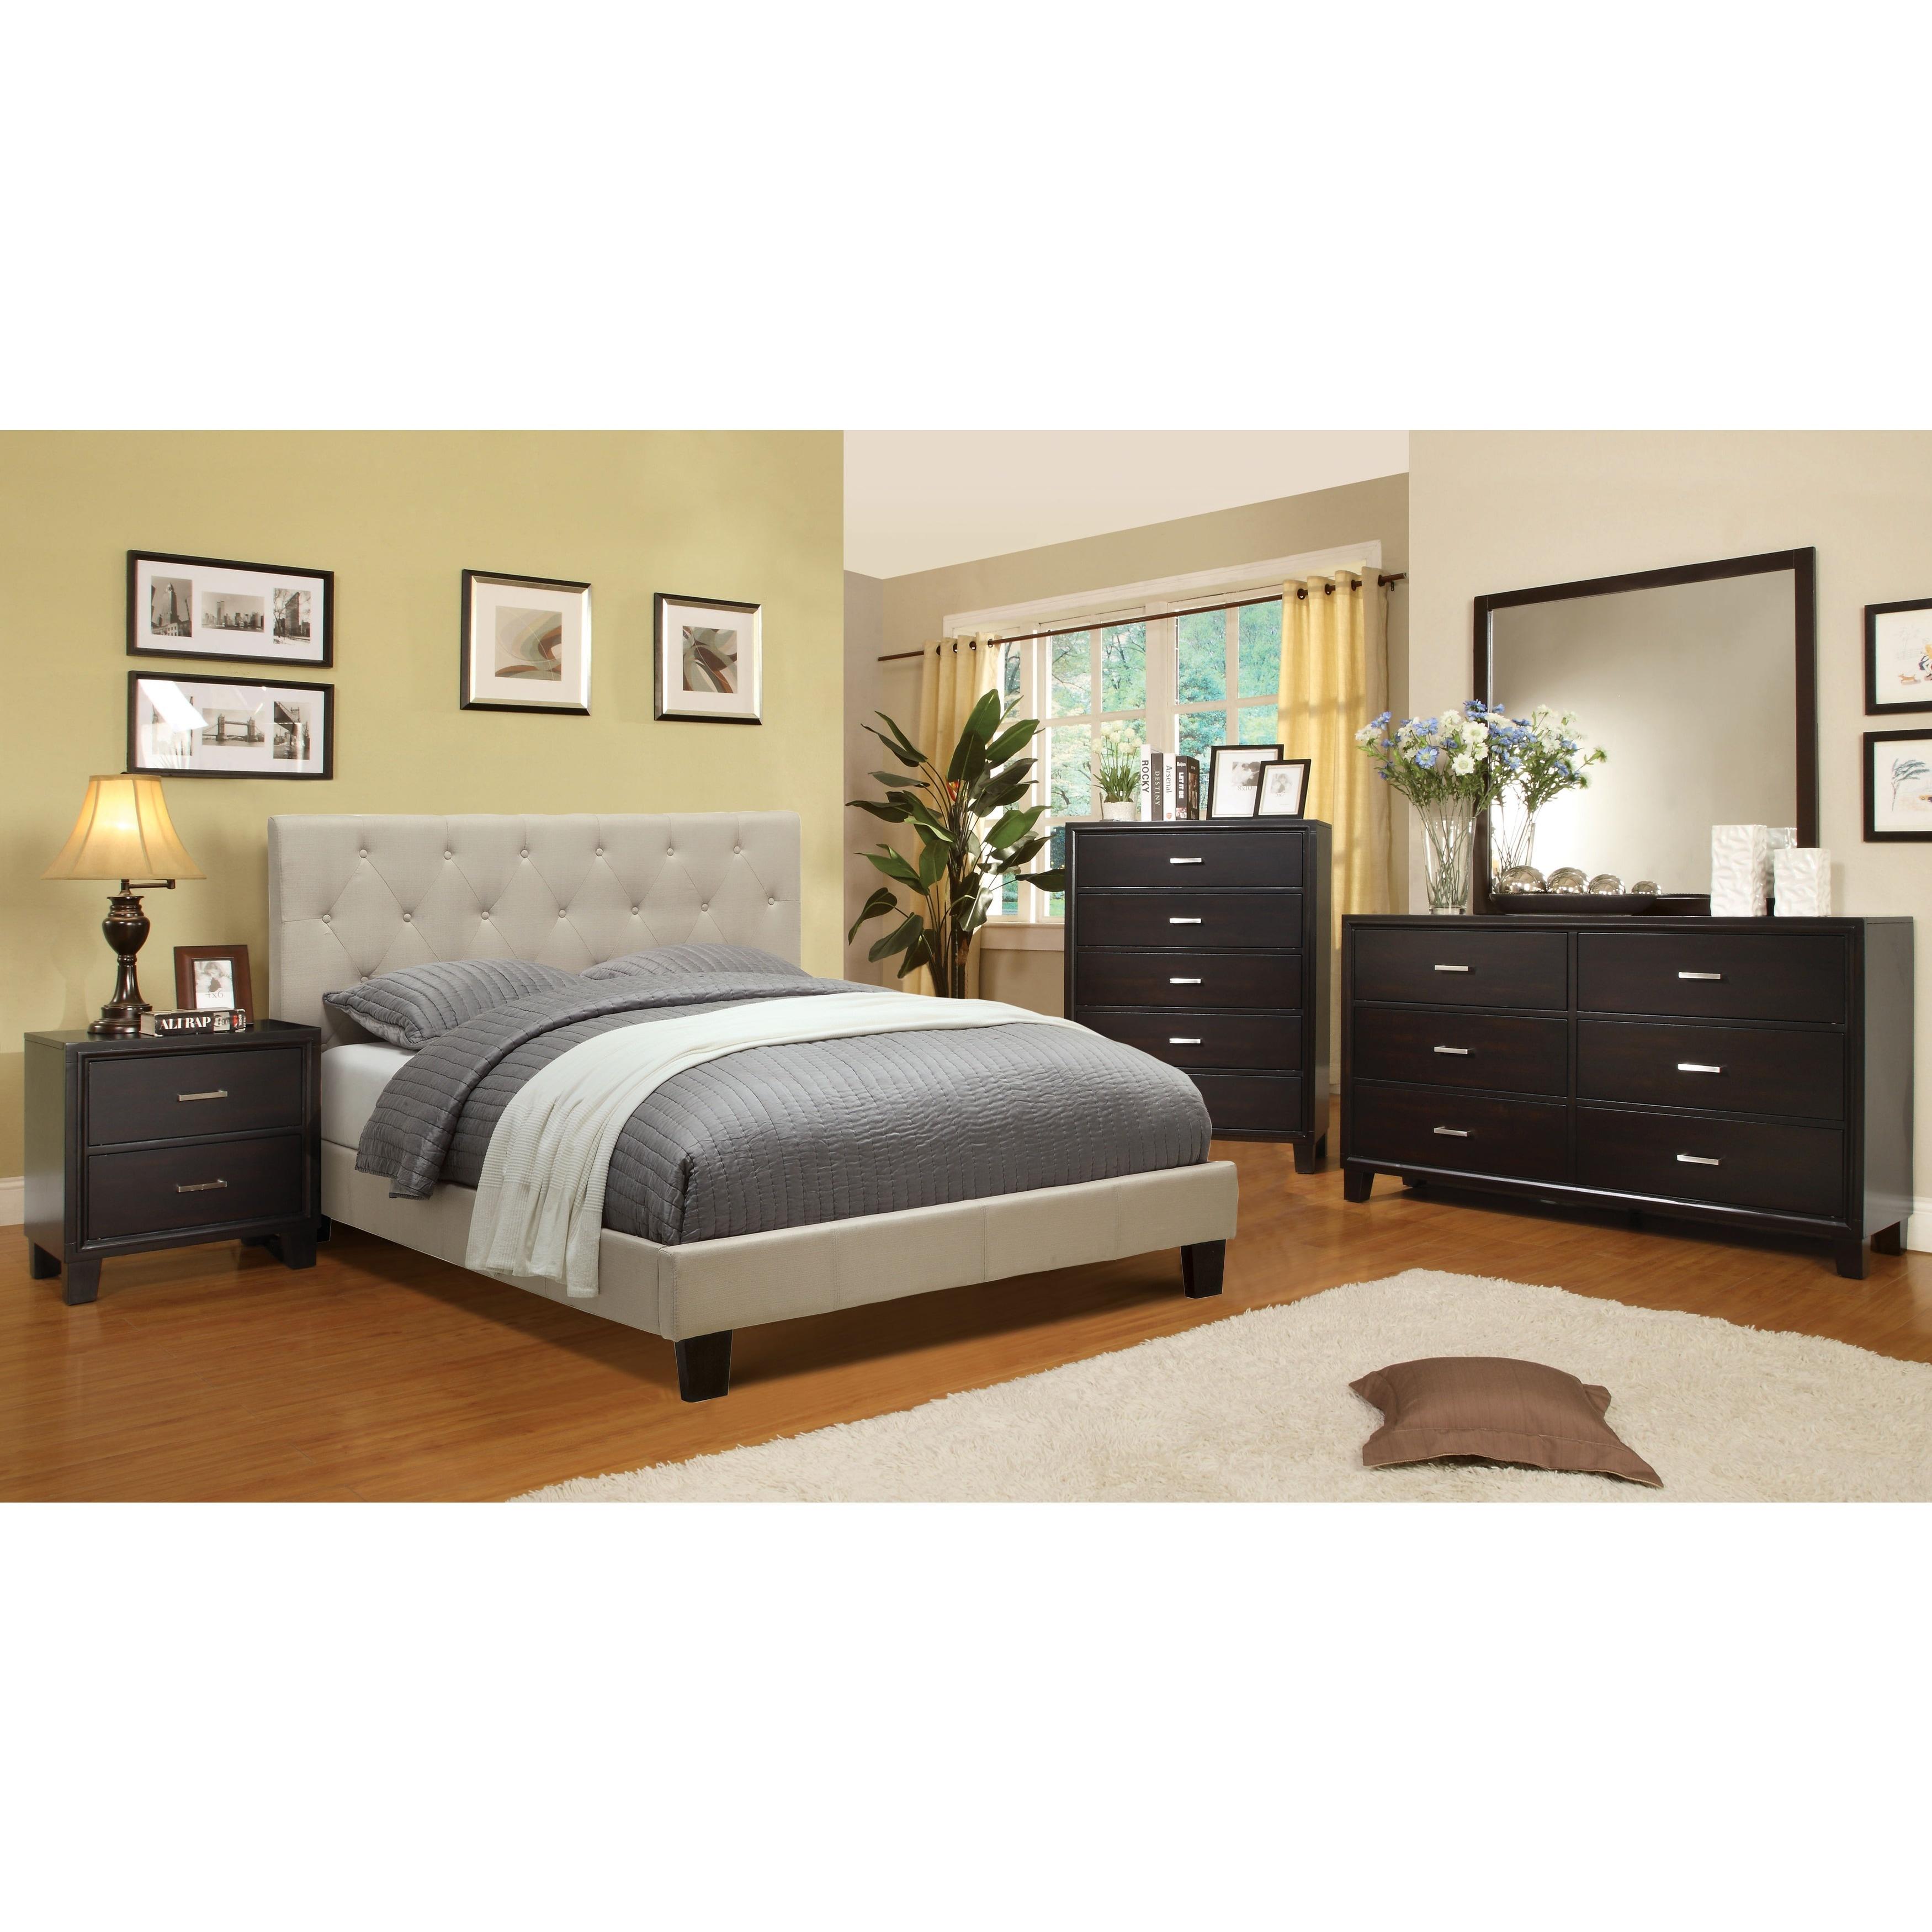 Furniture of America Perdella 4-piece Ivory Low Profile Bedroom ...